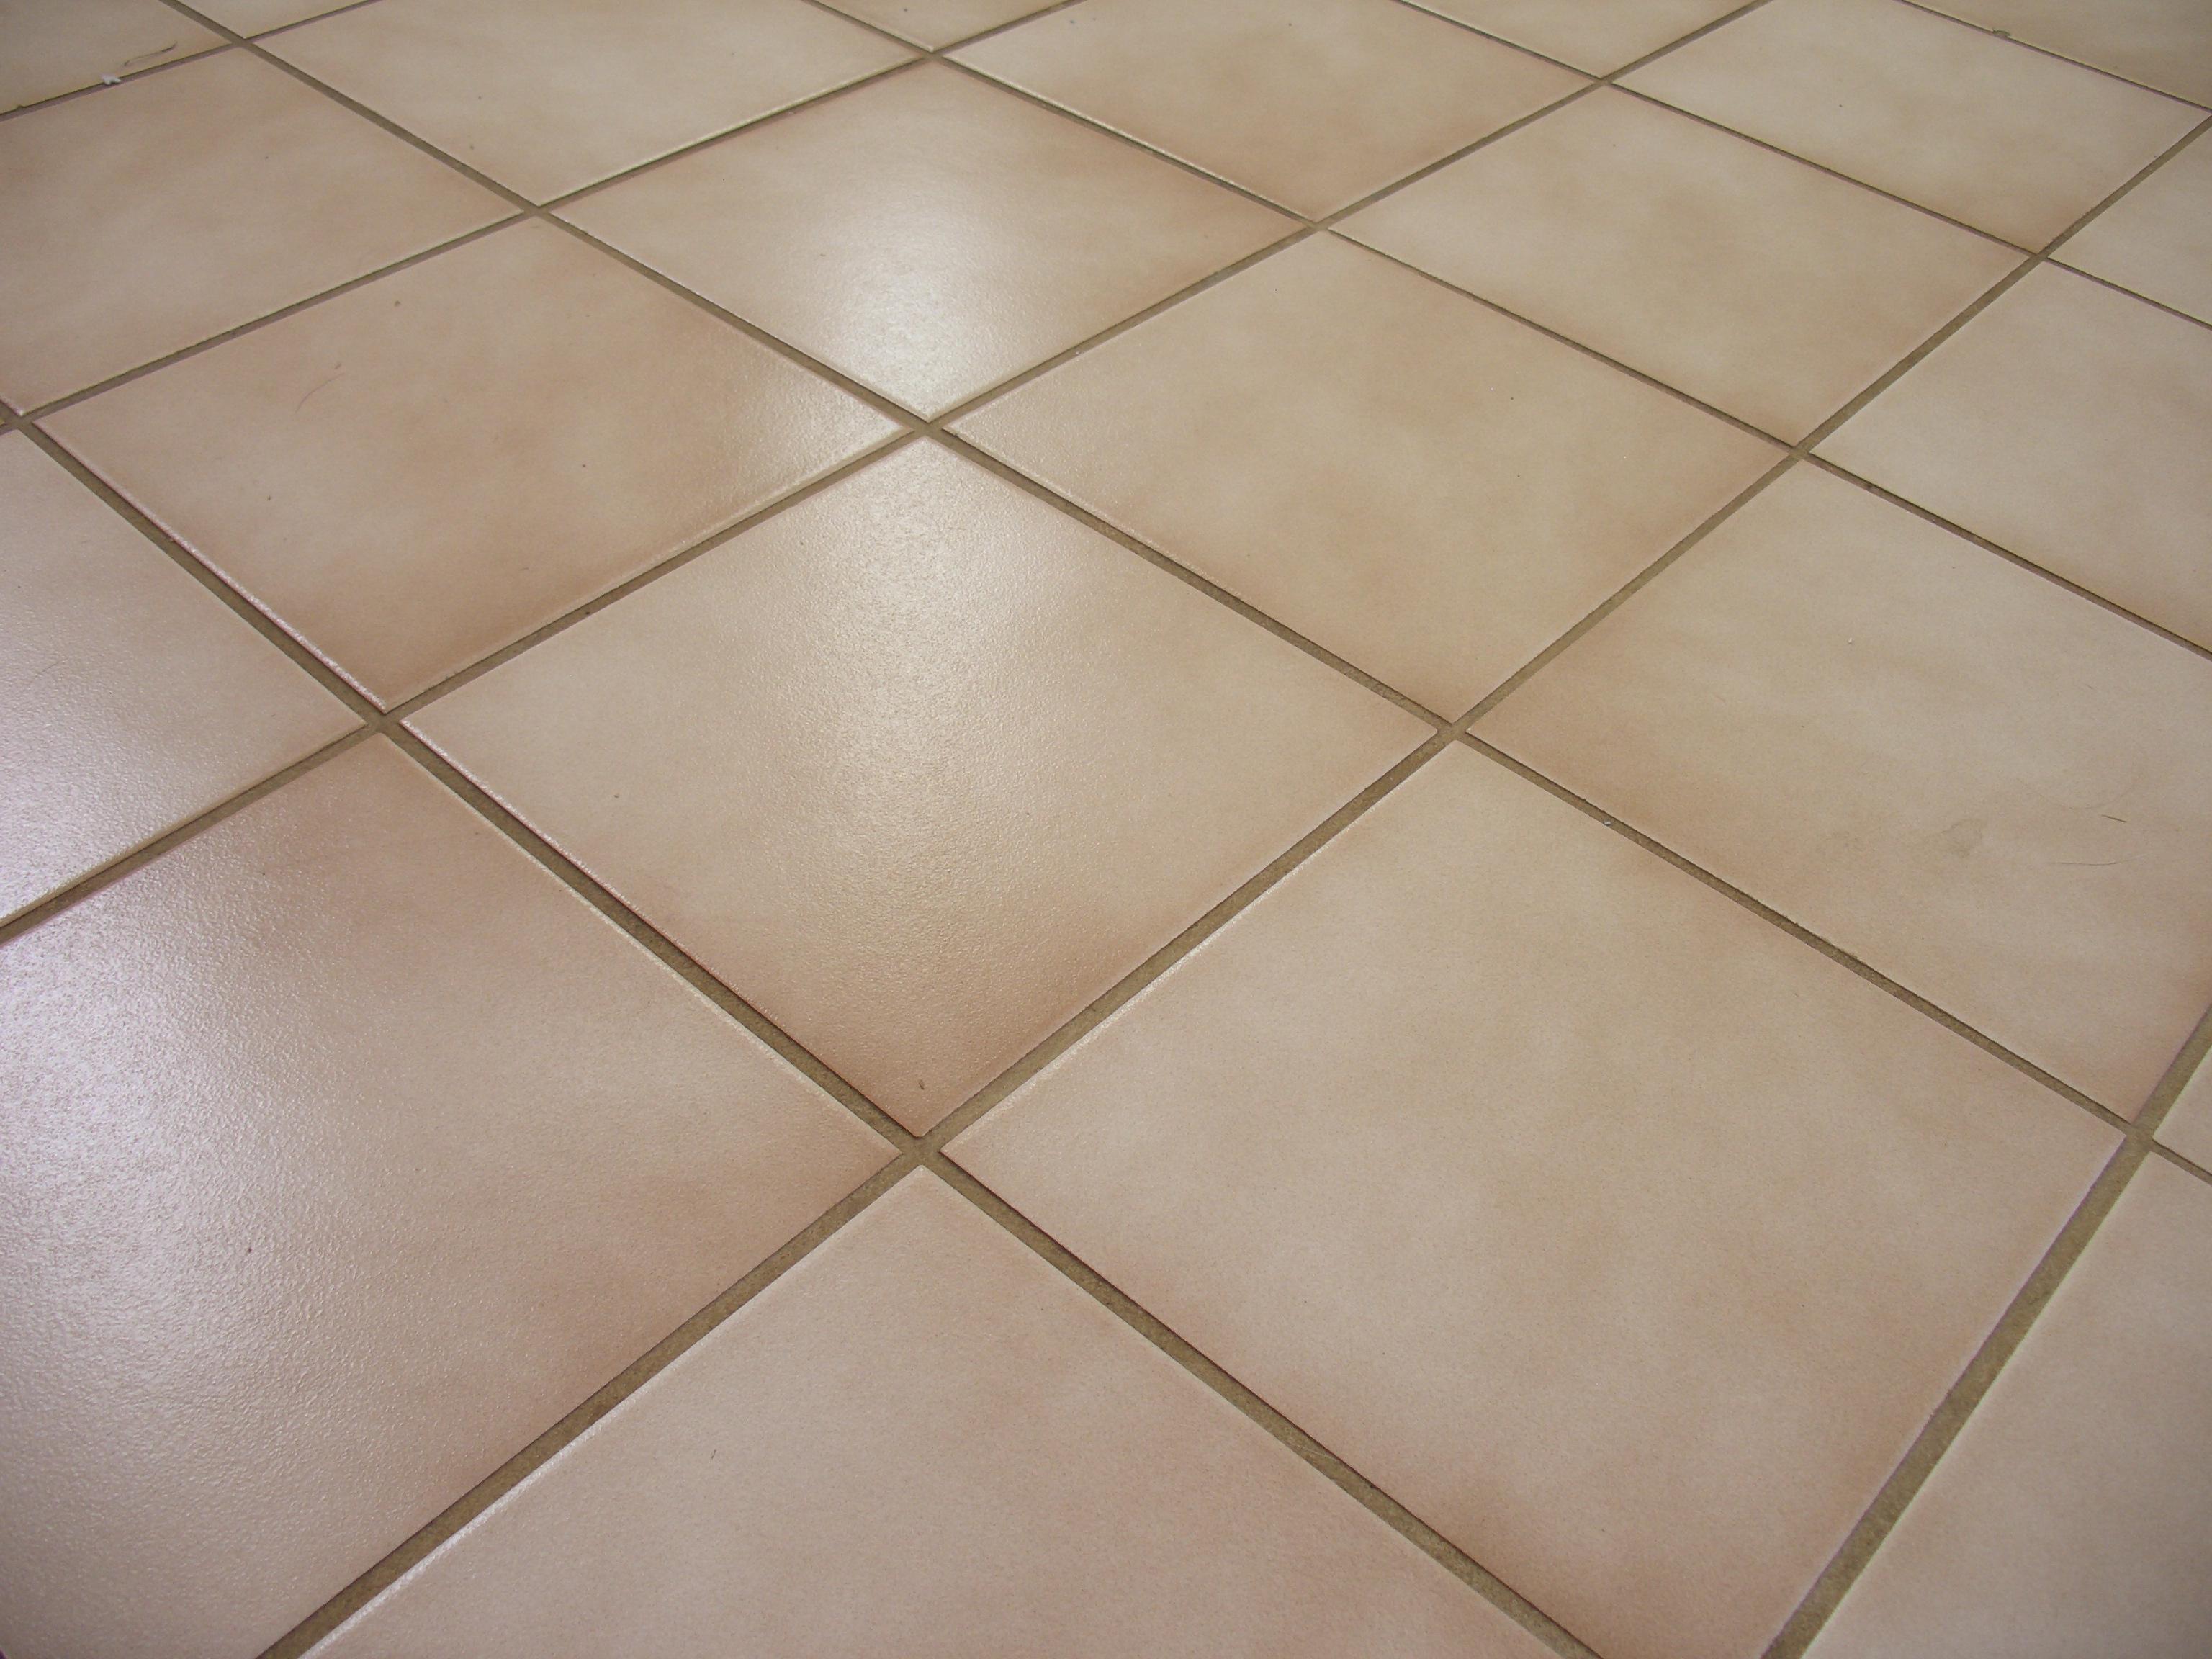 Tile & Grout Cleaning | Albuquerque, NM | Precise Carpet Care